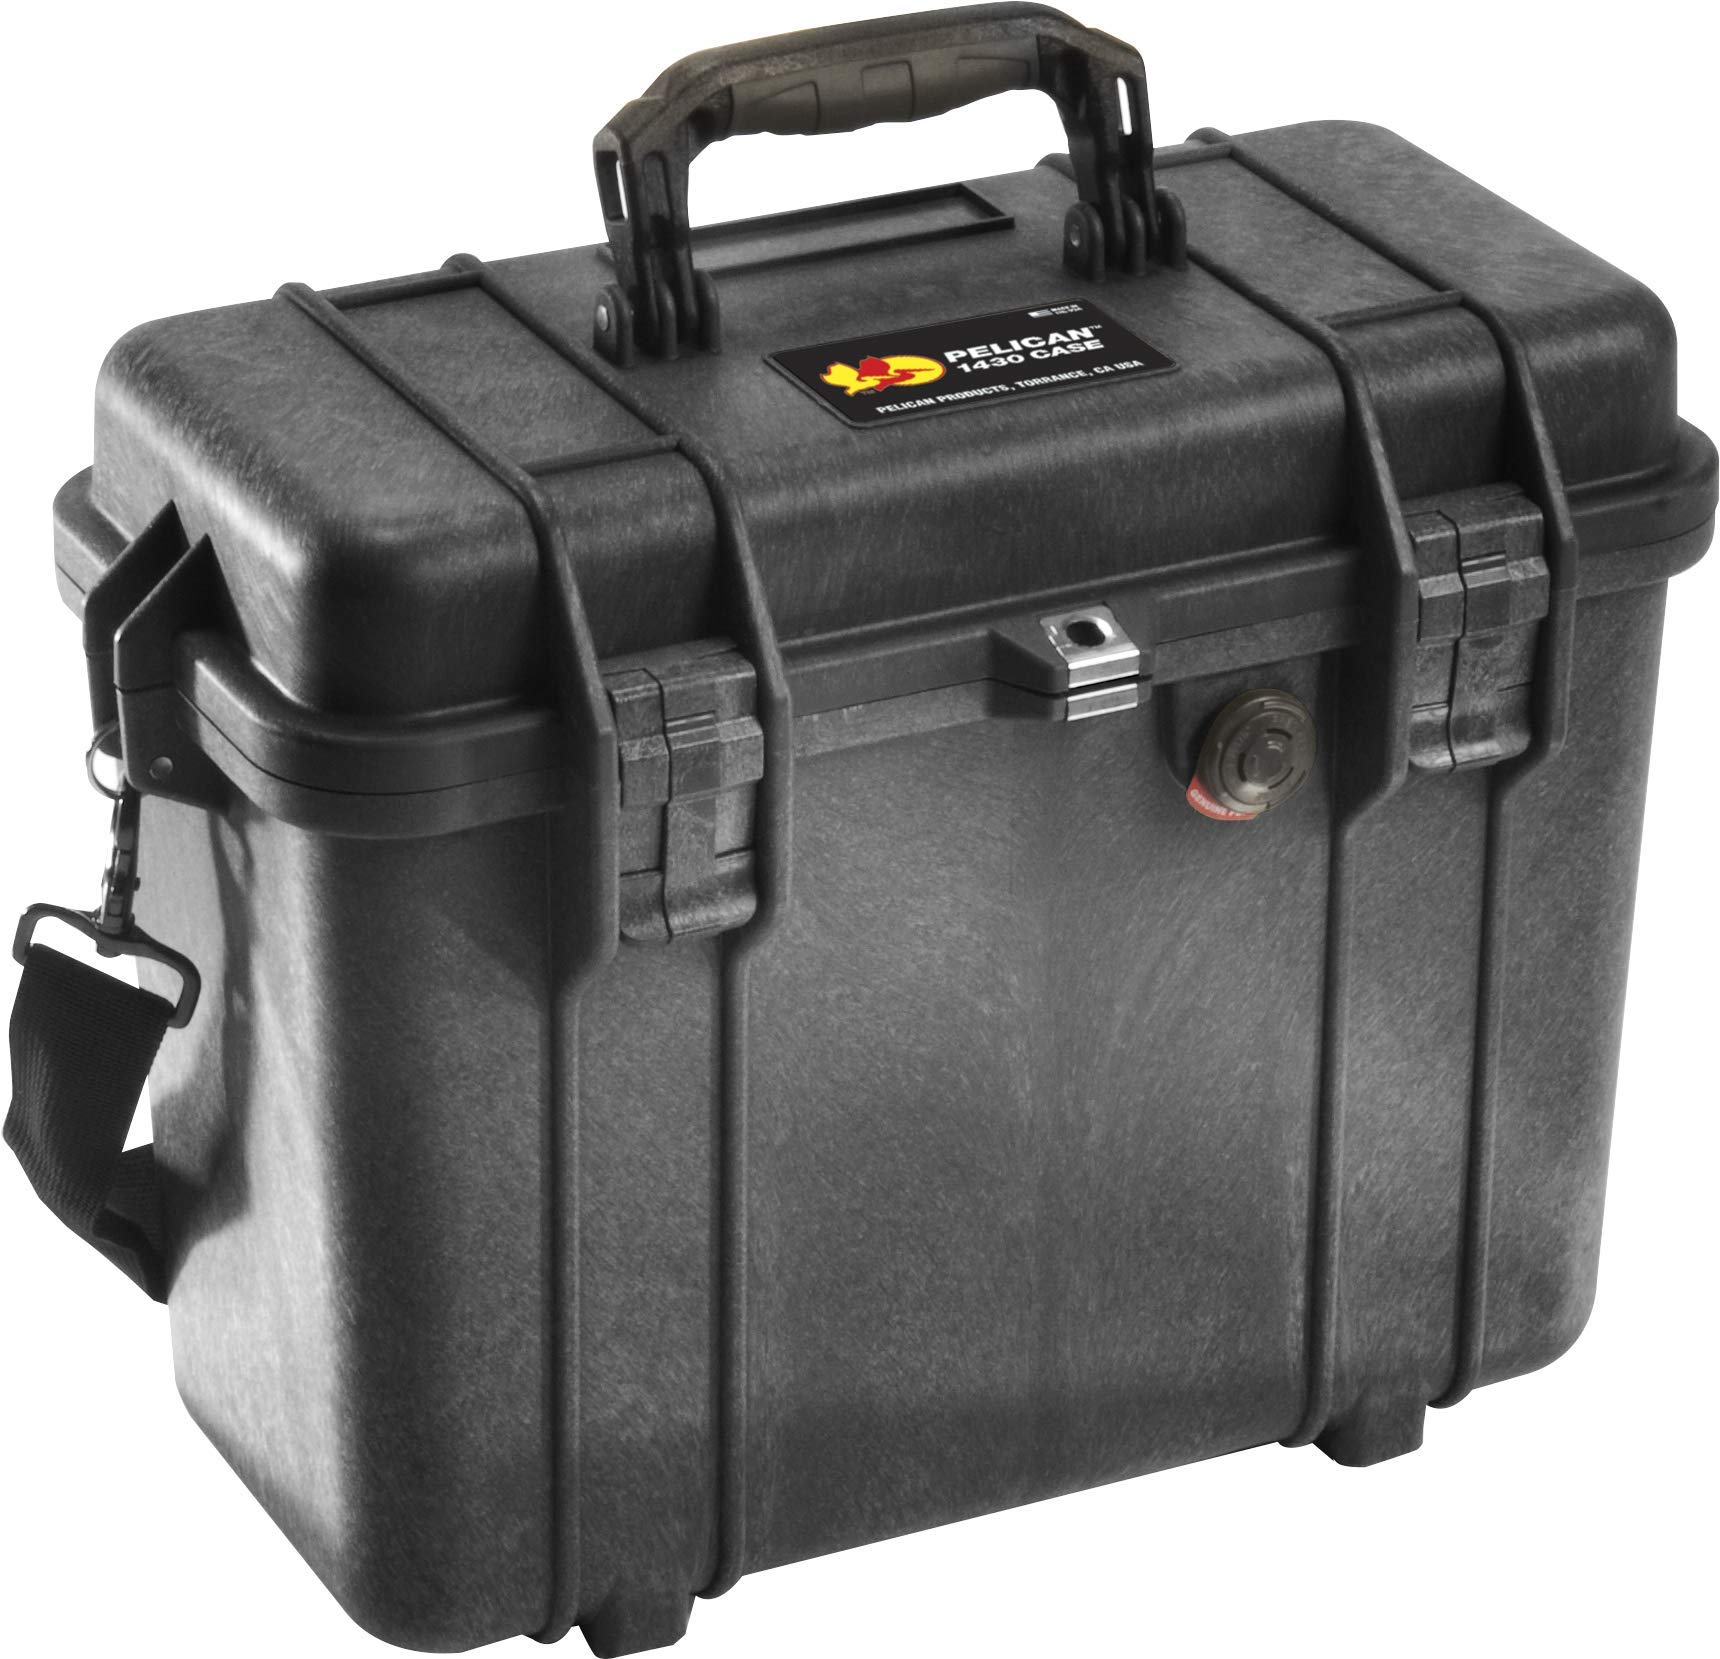 Pelican 1430 - Caja (Polipropileno (PP), Negro, 344 mm, 146 mm, 297 mm, 2,95 kg): Amazon.es: Informática